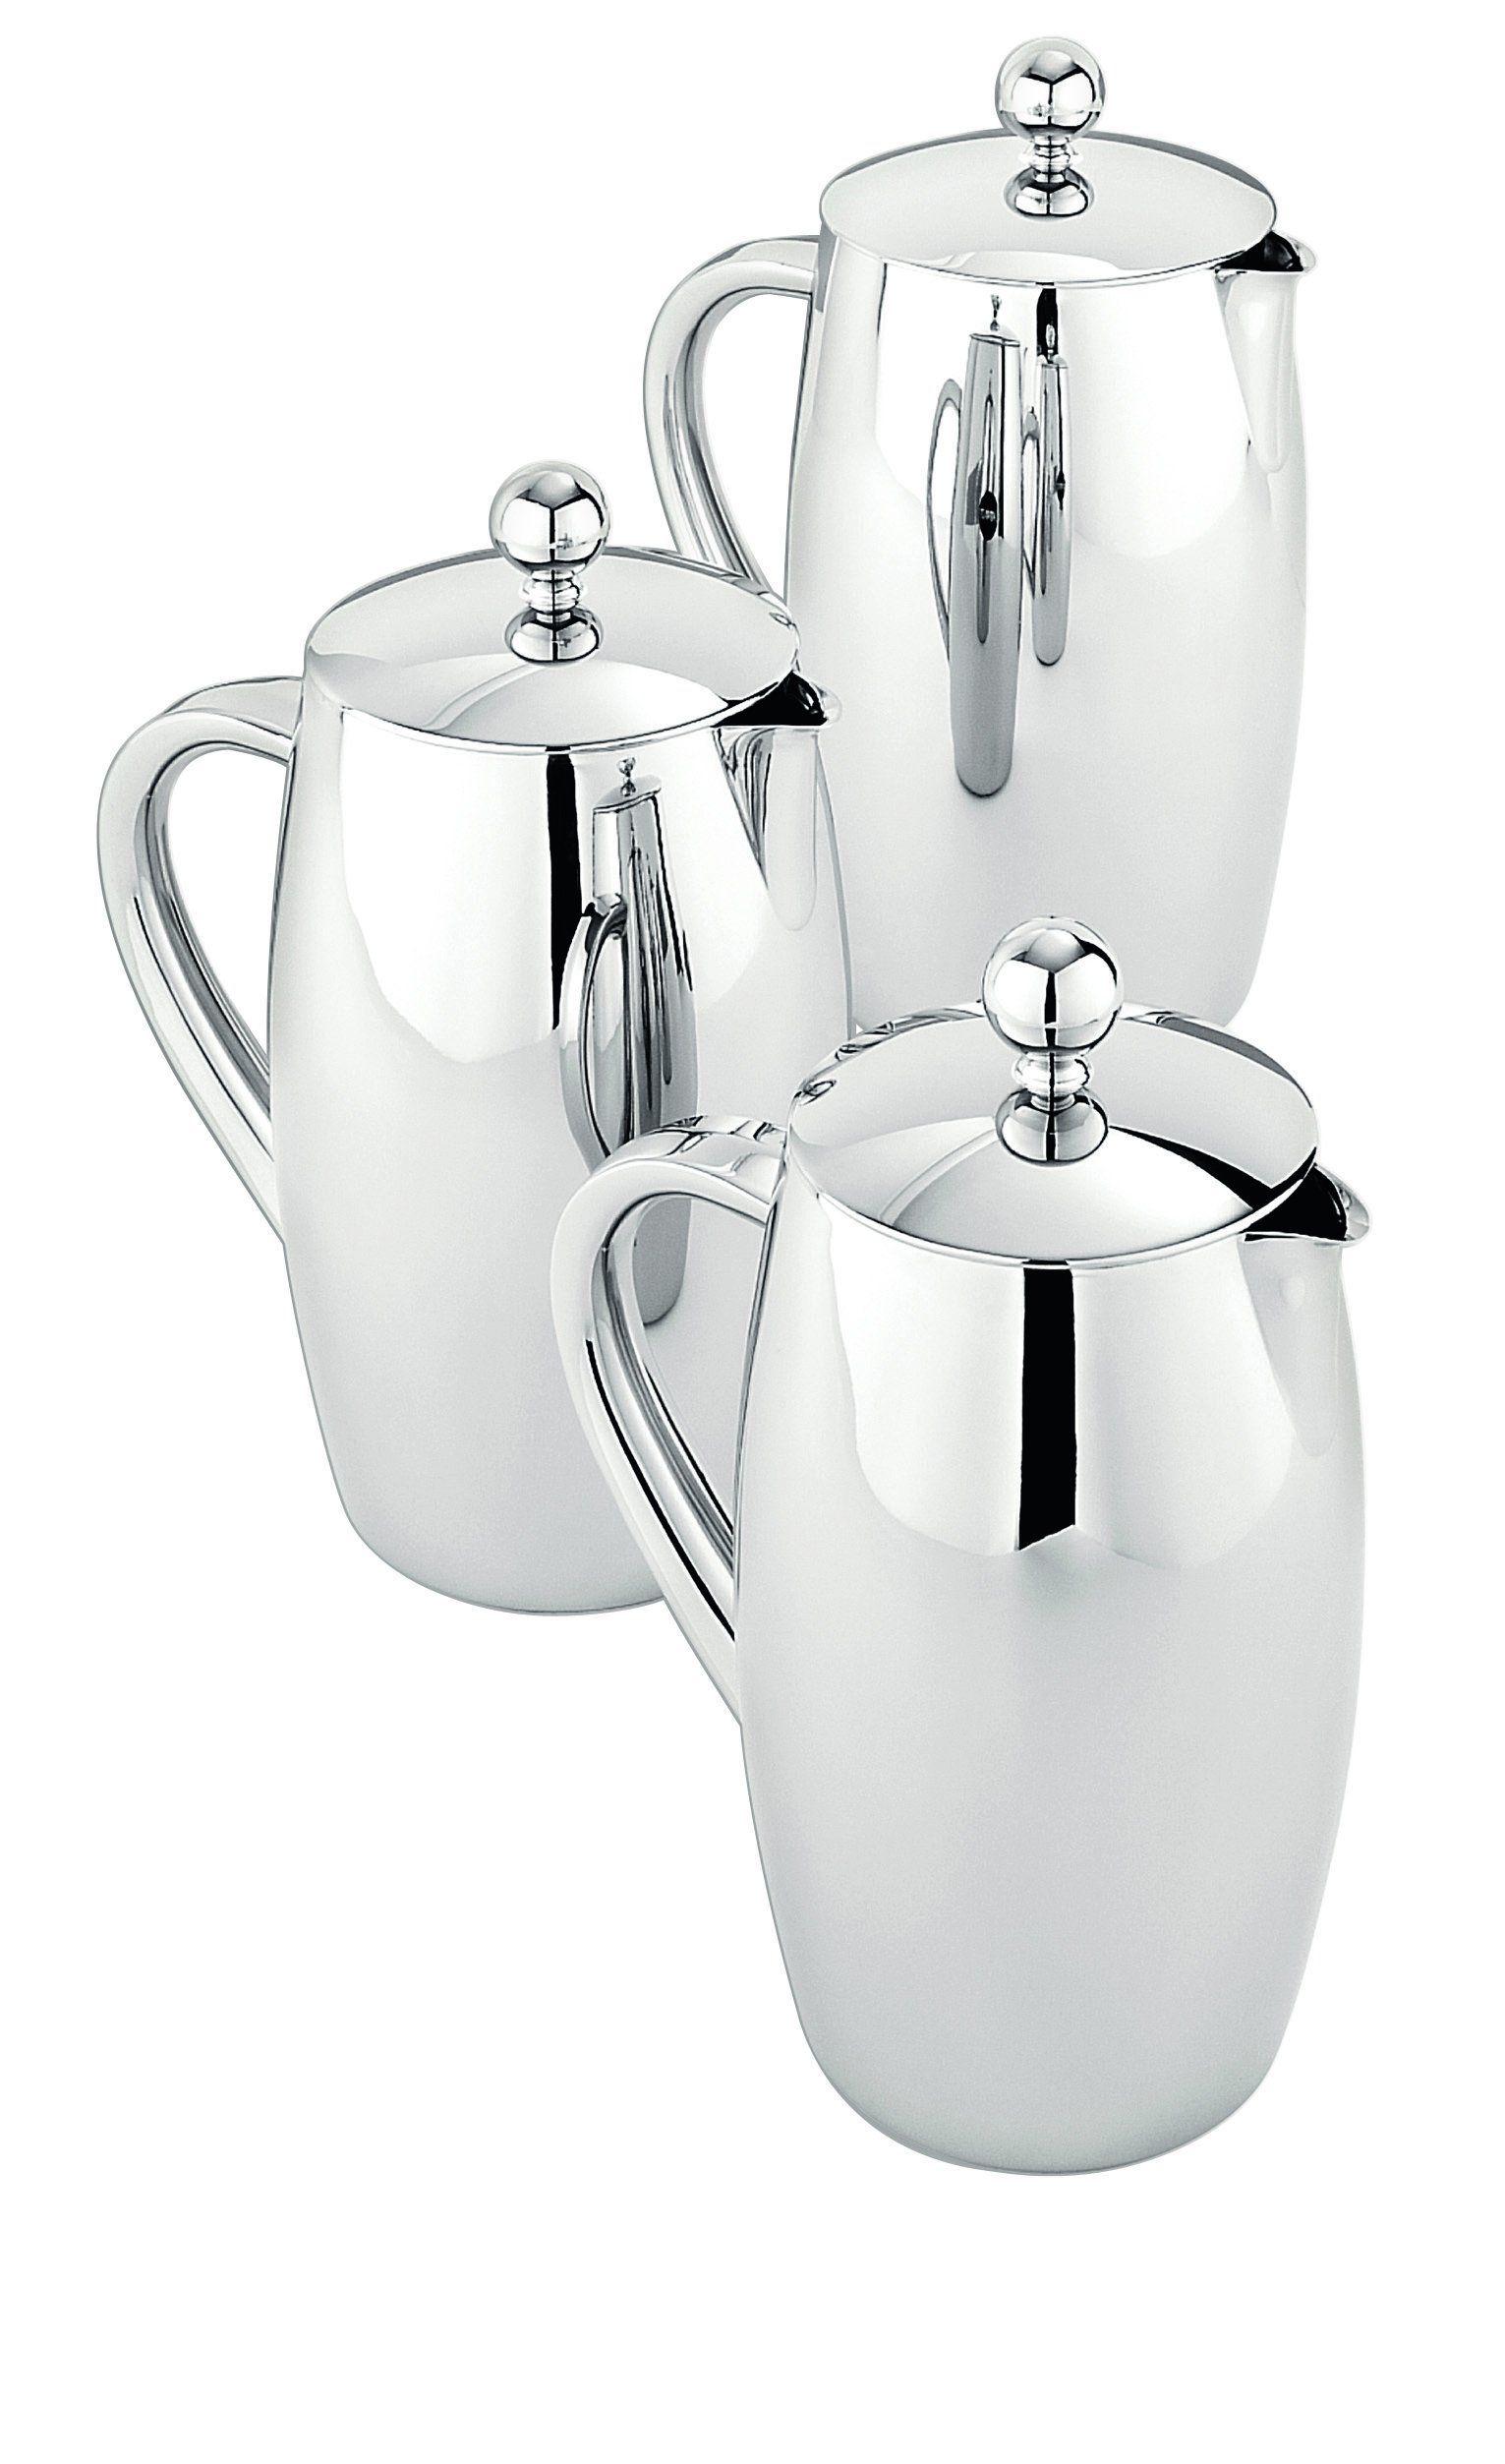 Avanti twin wall coffee plunger kitchen homedecor